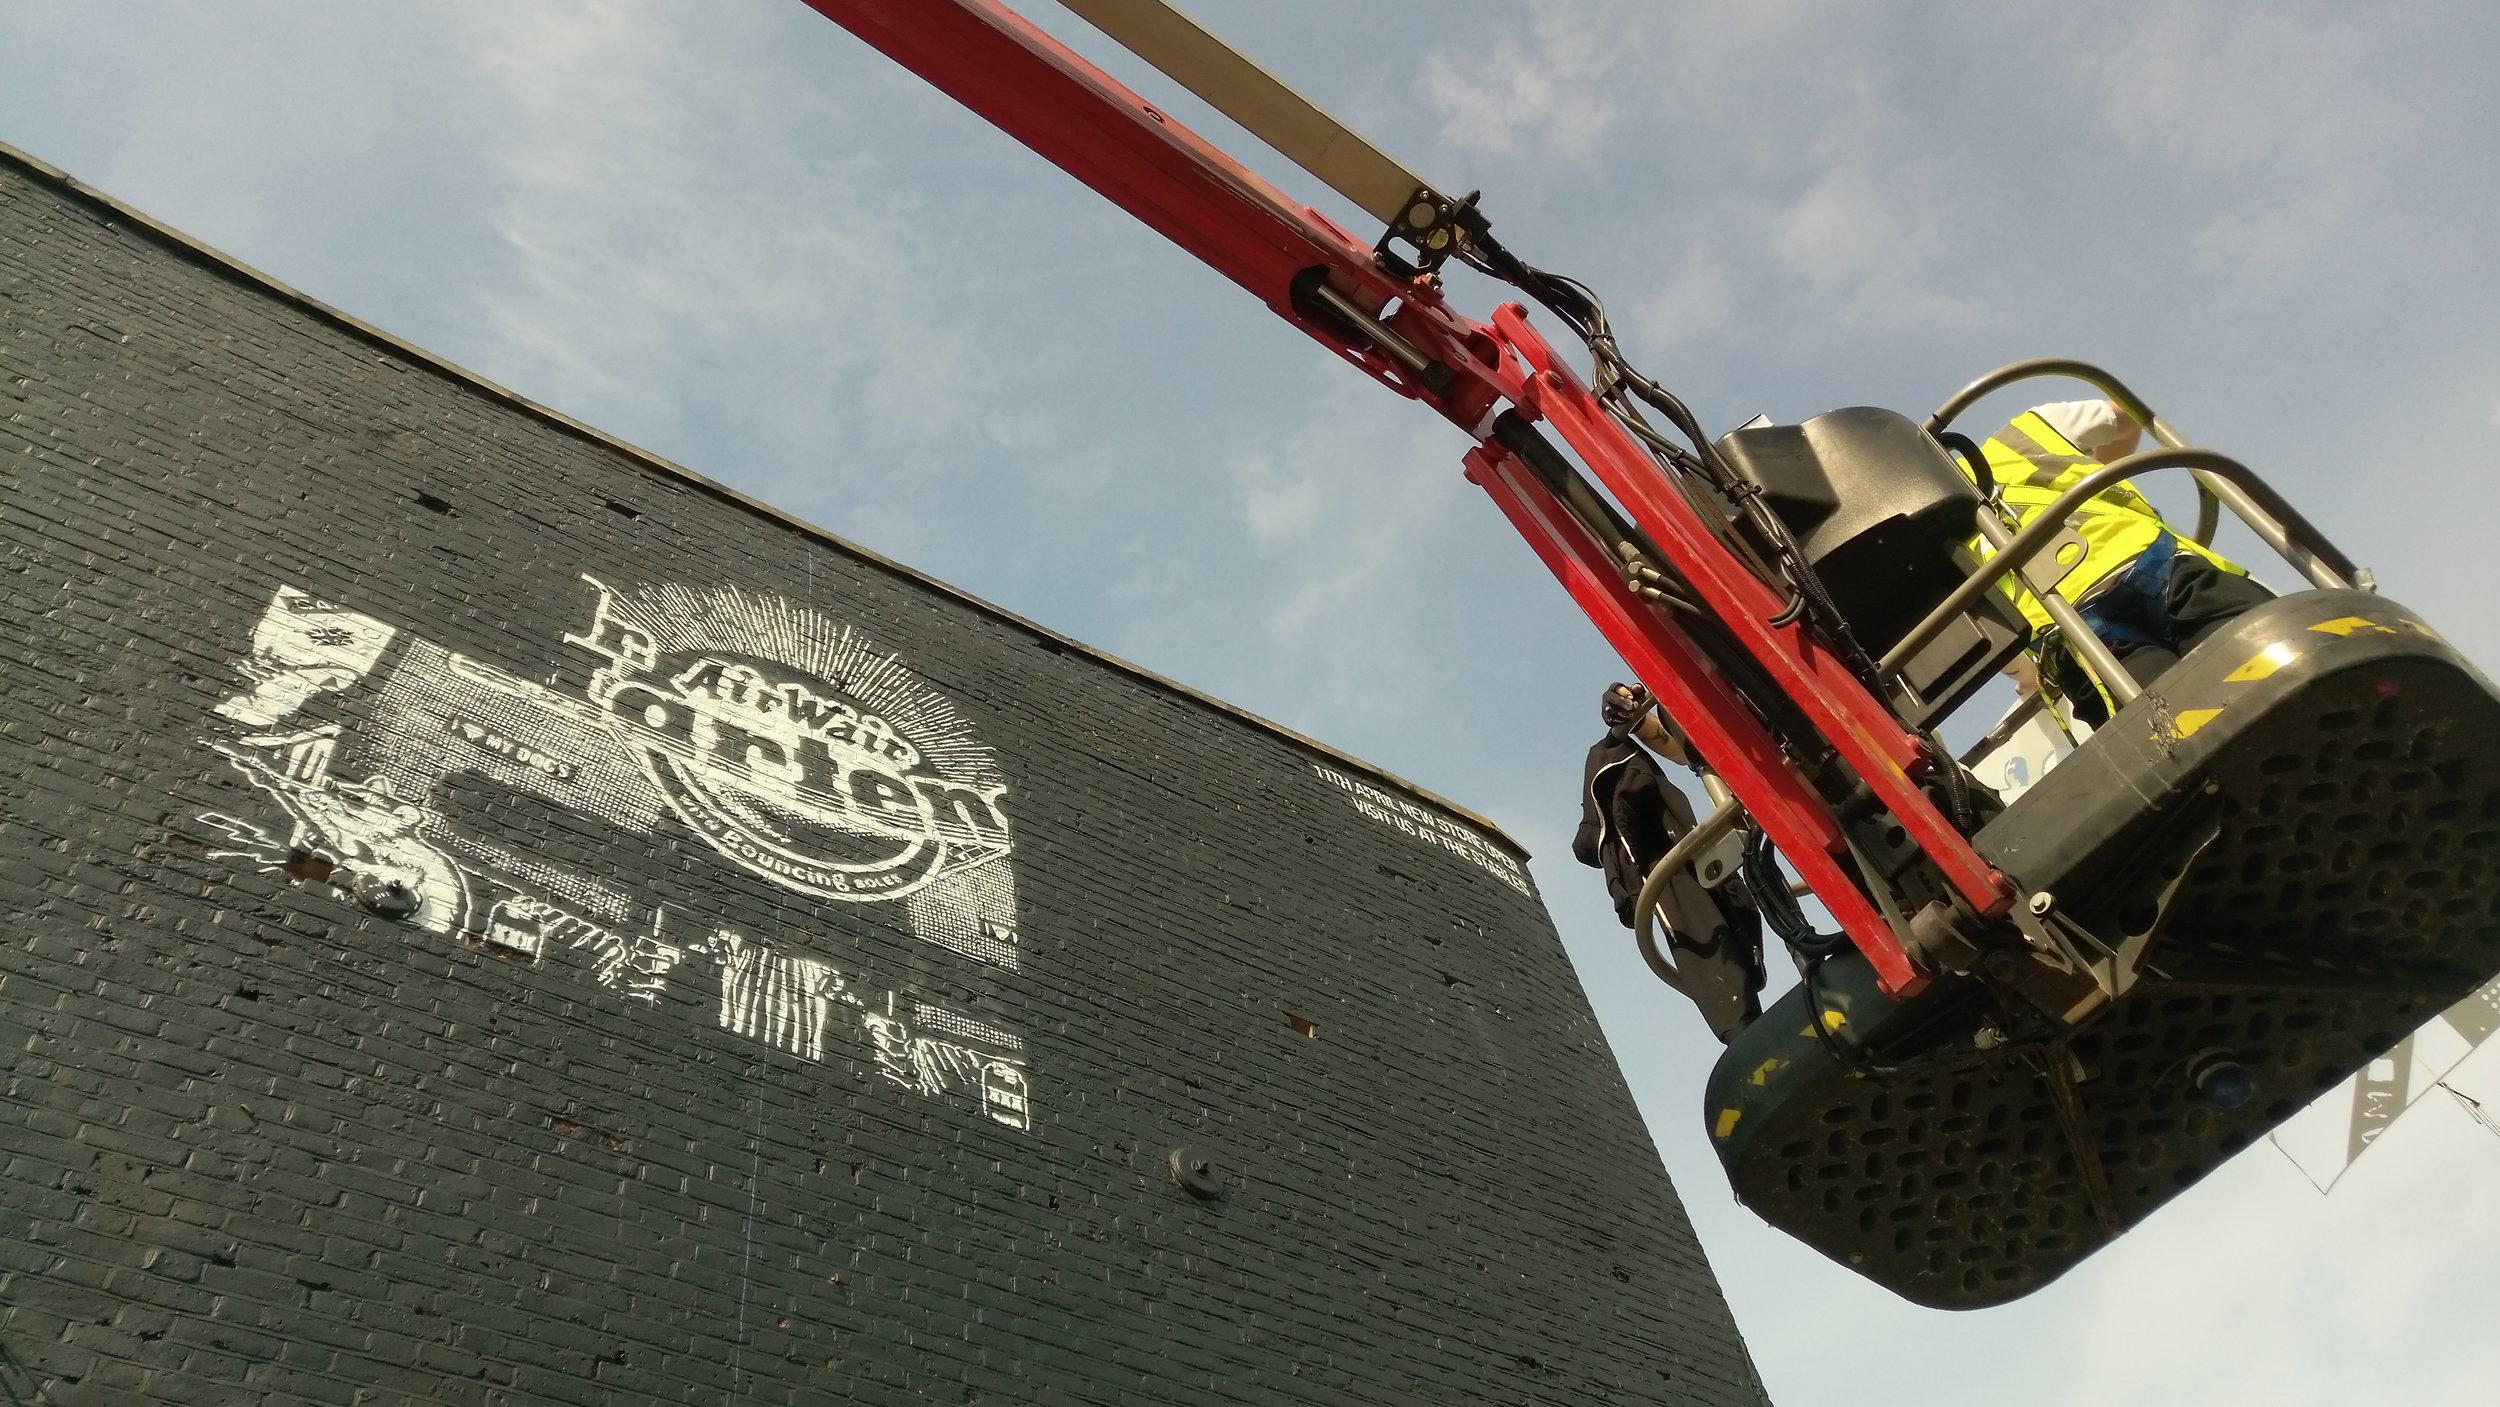 Dr Martens Mural Project | Lift